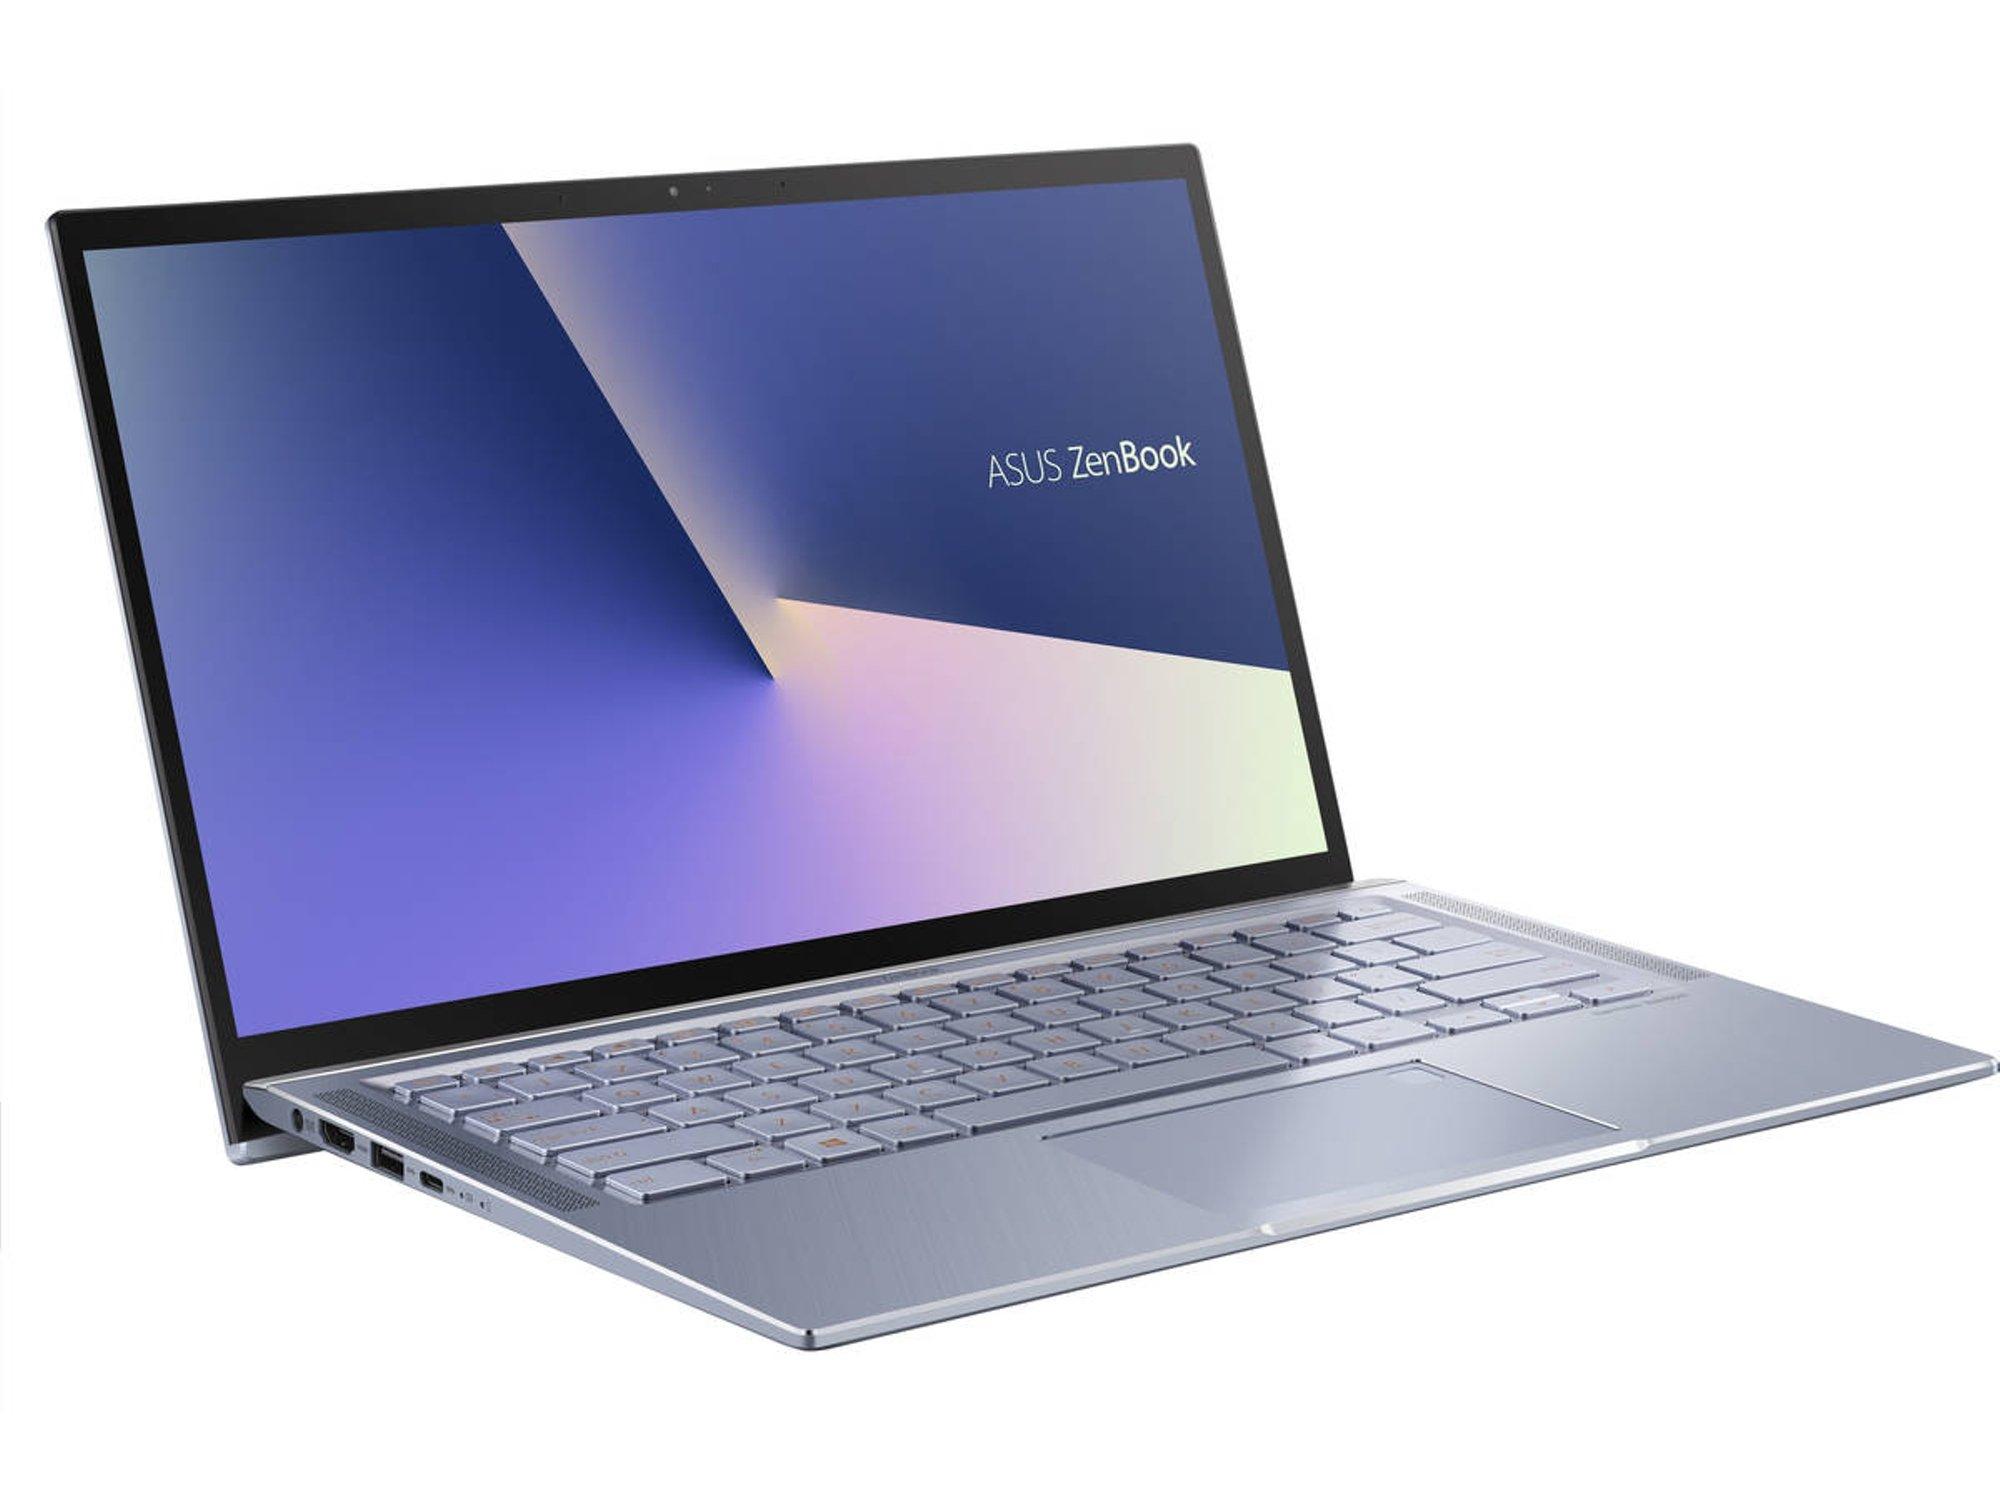 Portátil ASUS ZenBook 14 UM431DA-AM056T - 512GB SSD y 16GB RAM